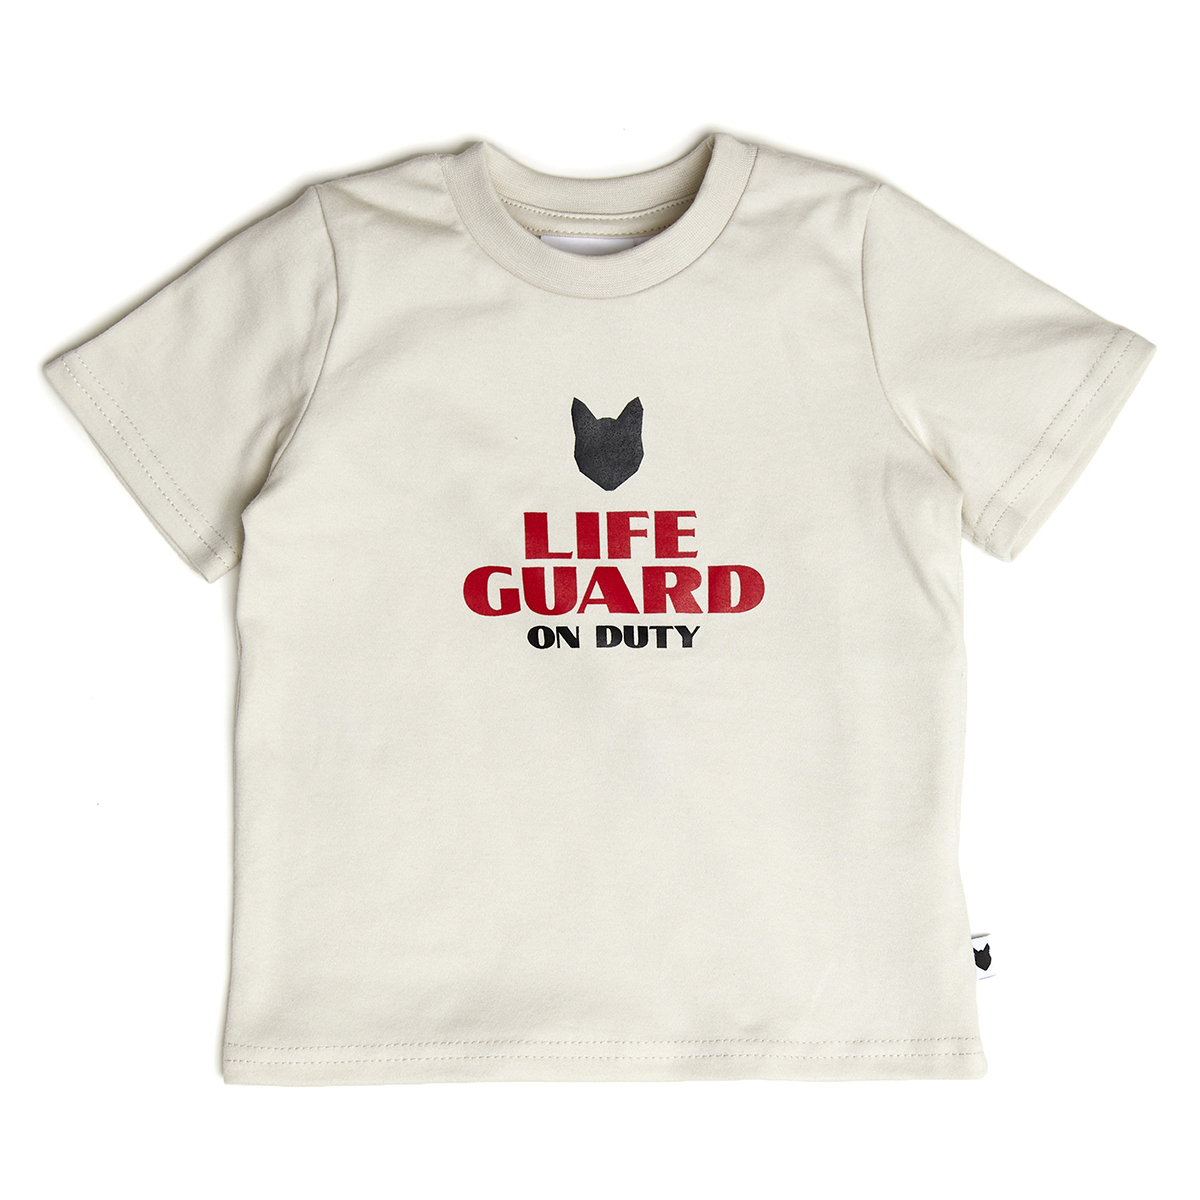 Hauts bébé Tee-Shirt Lifeguard - 18/24 Mois